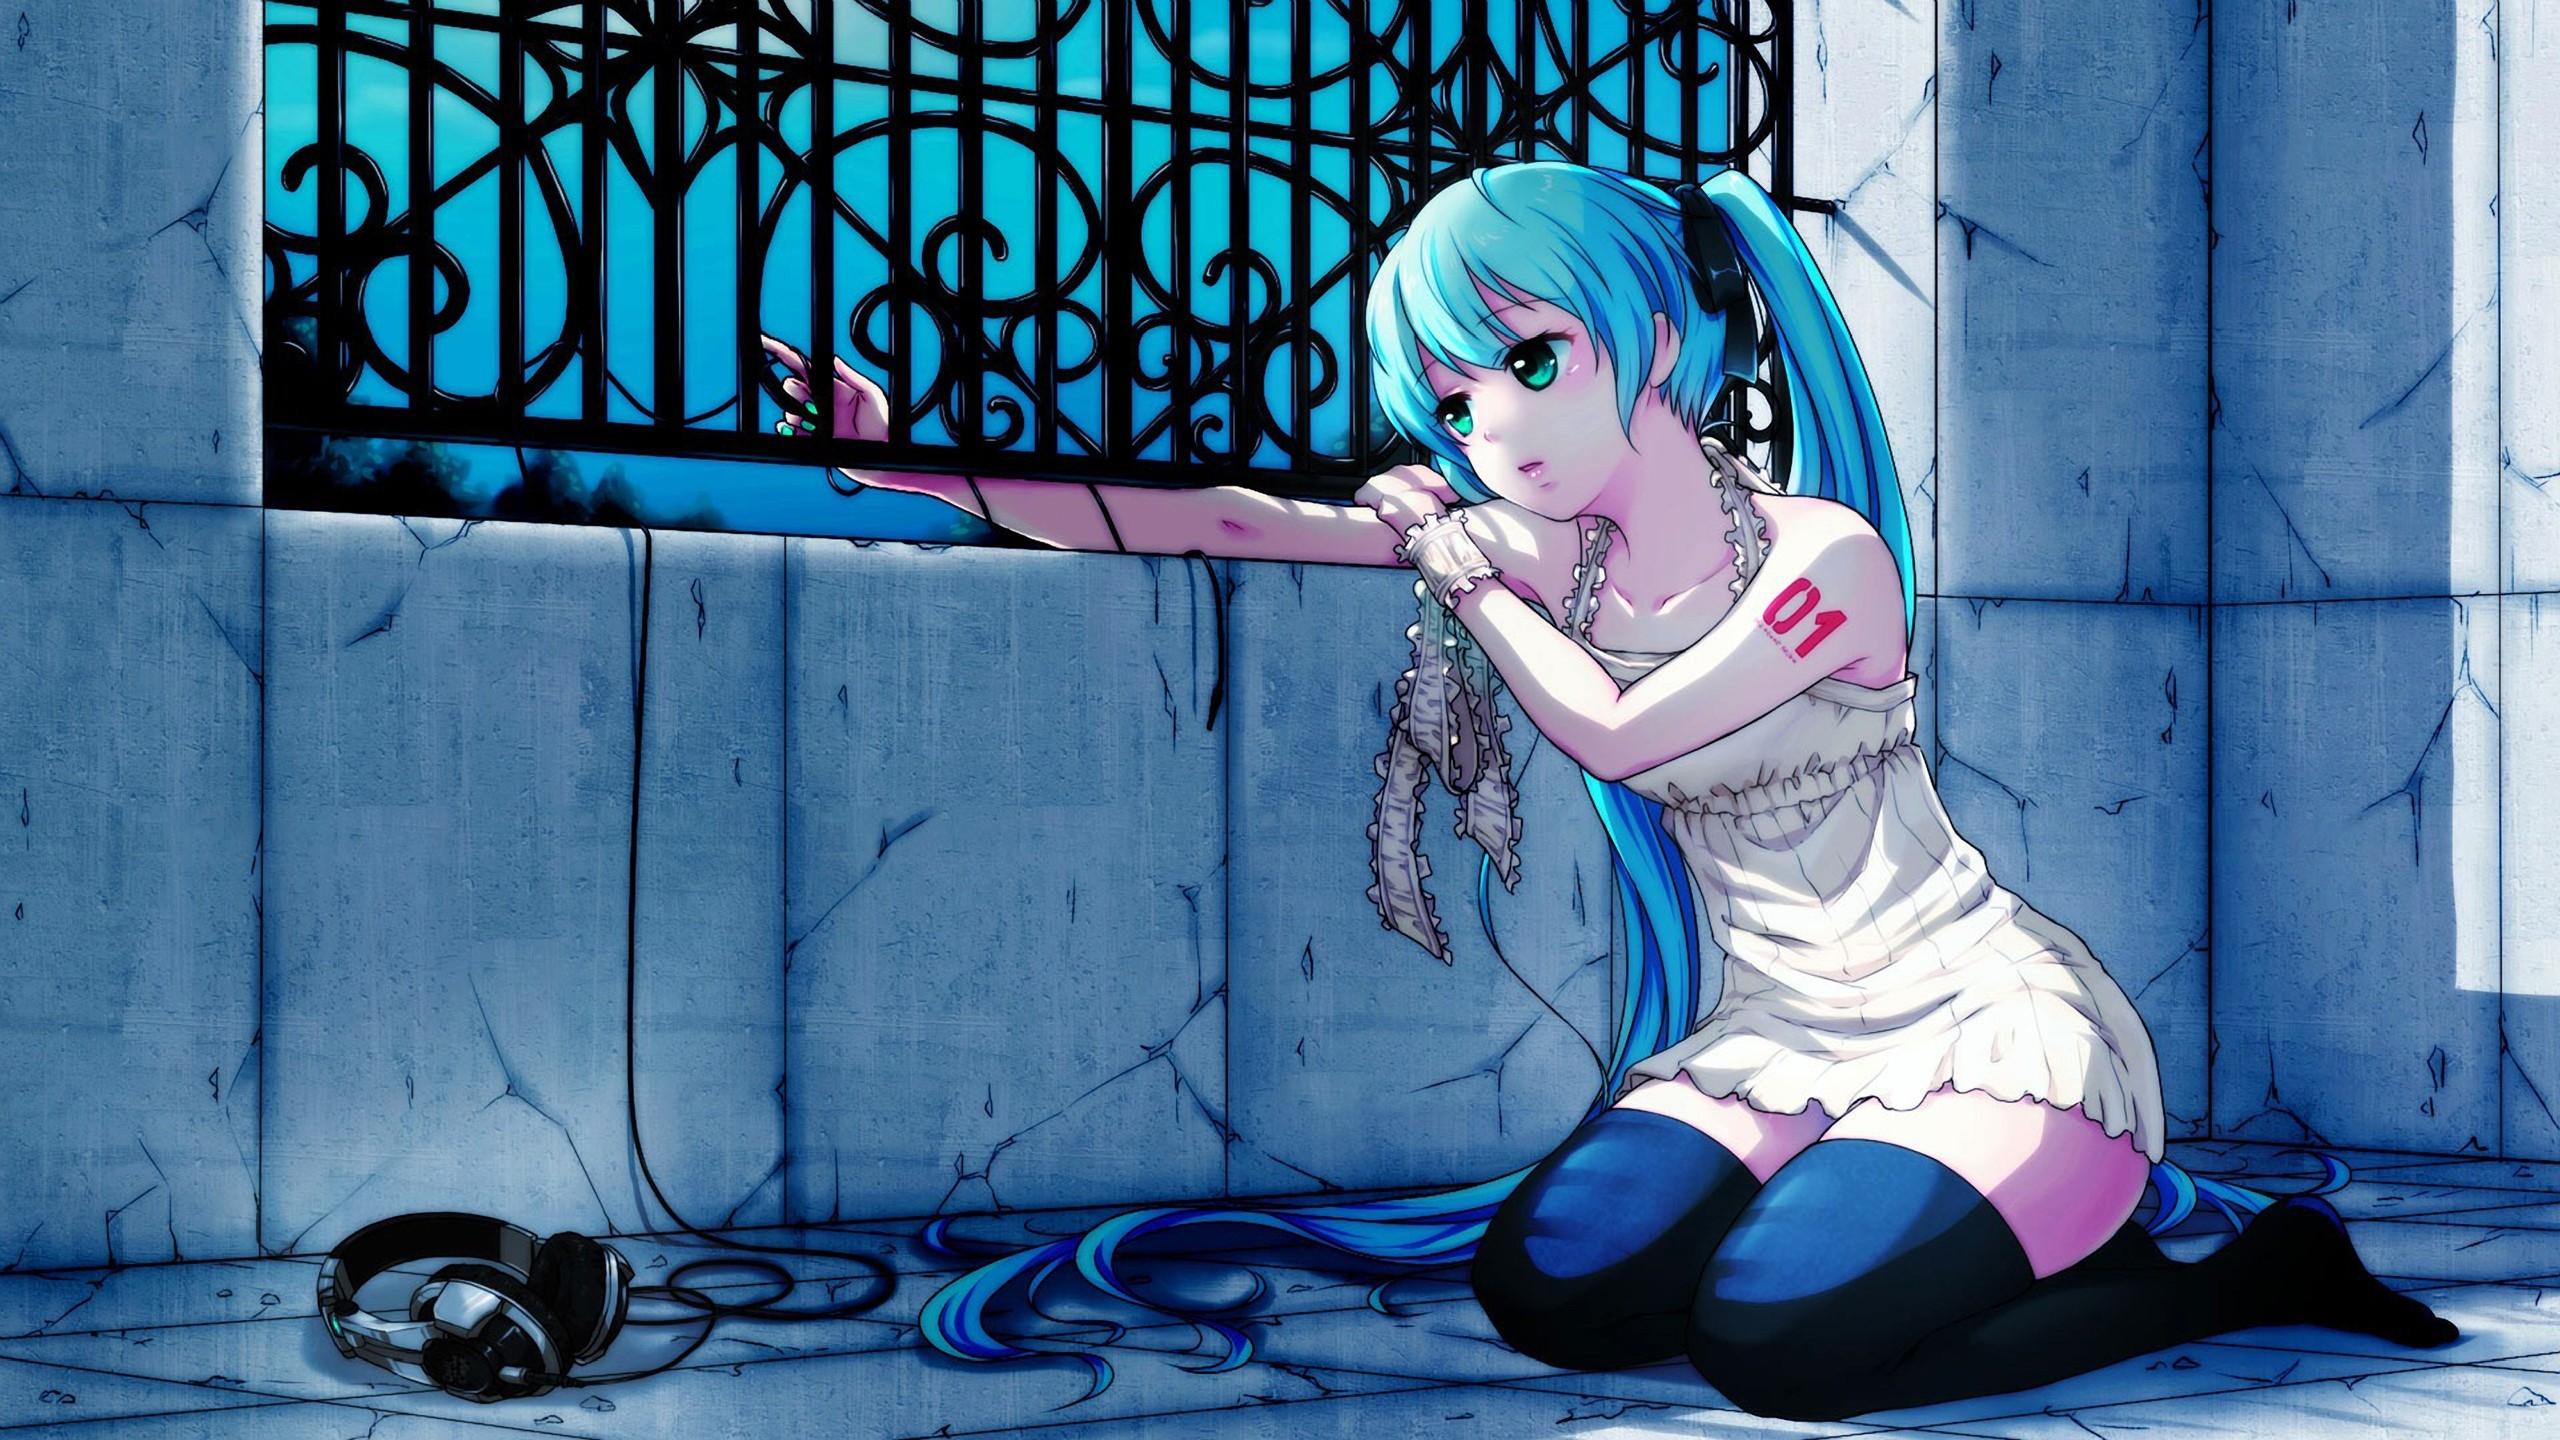 Anime Girl Hair Headphones Sadness Fence